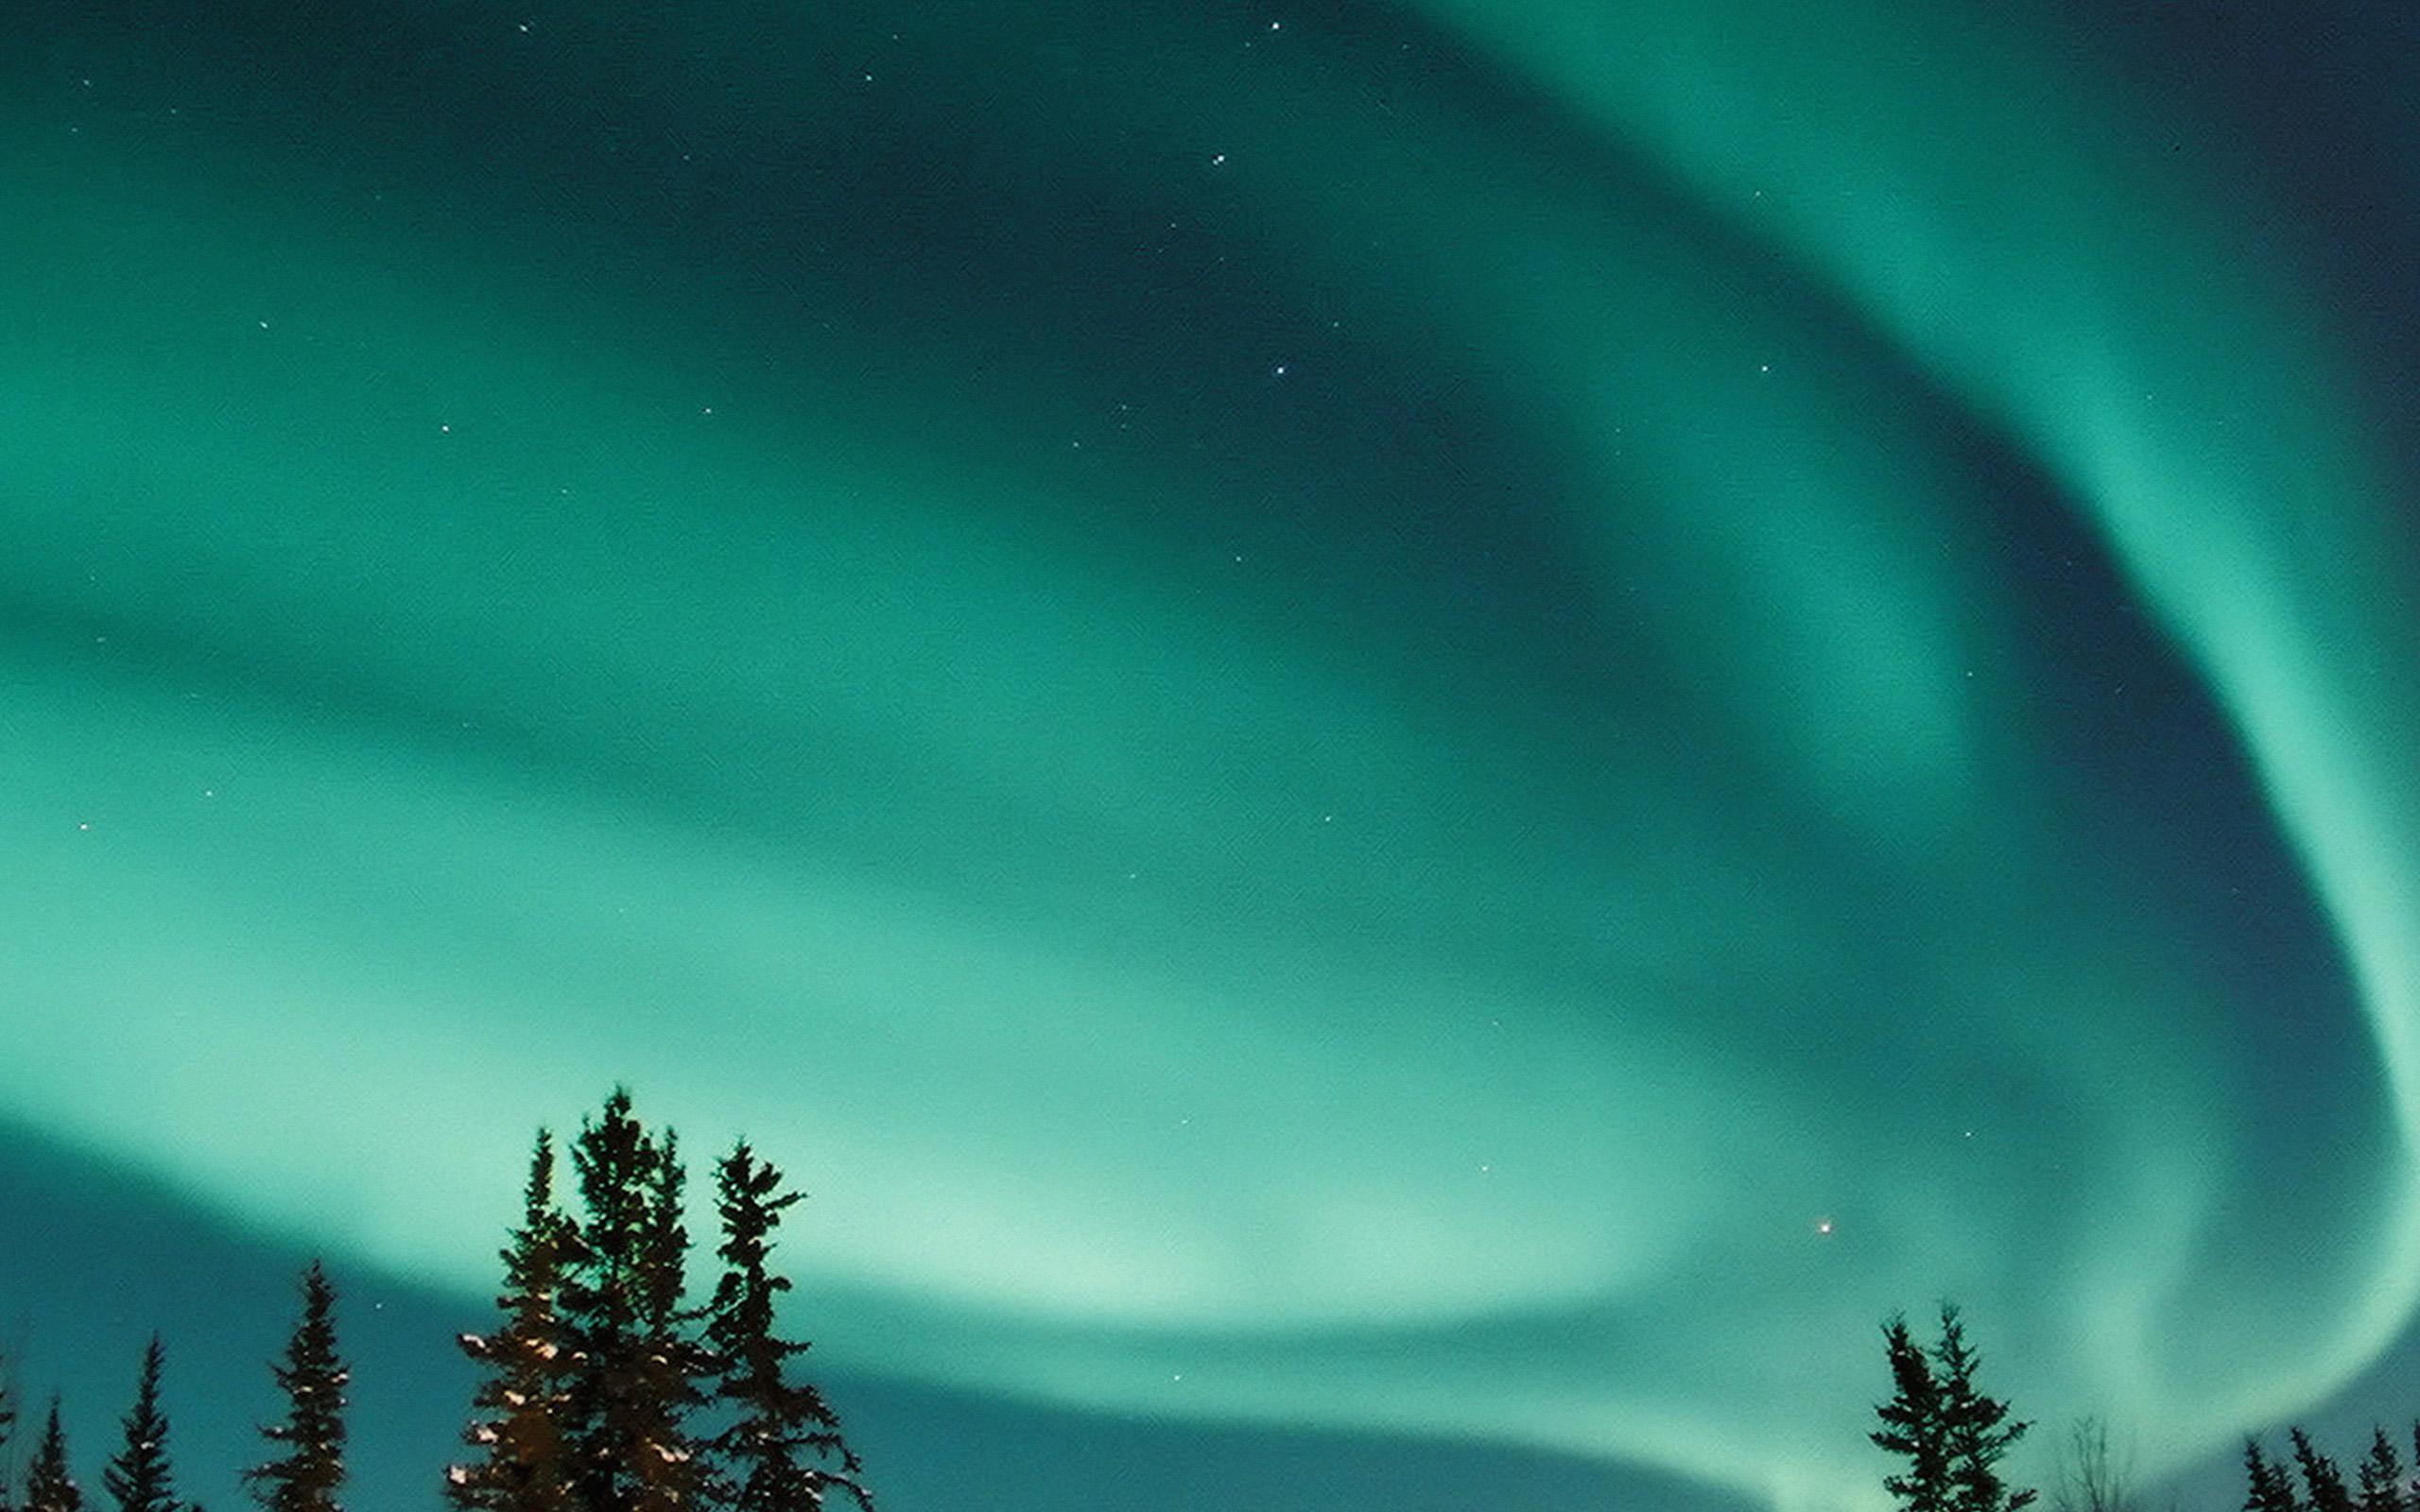 Nw70 aurora blue night sky space nature winter wallpaper - Space night sky wallpaper ...